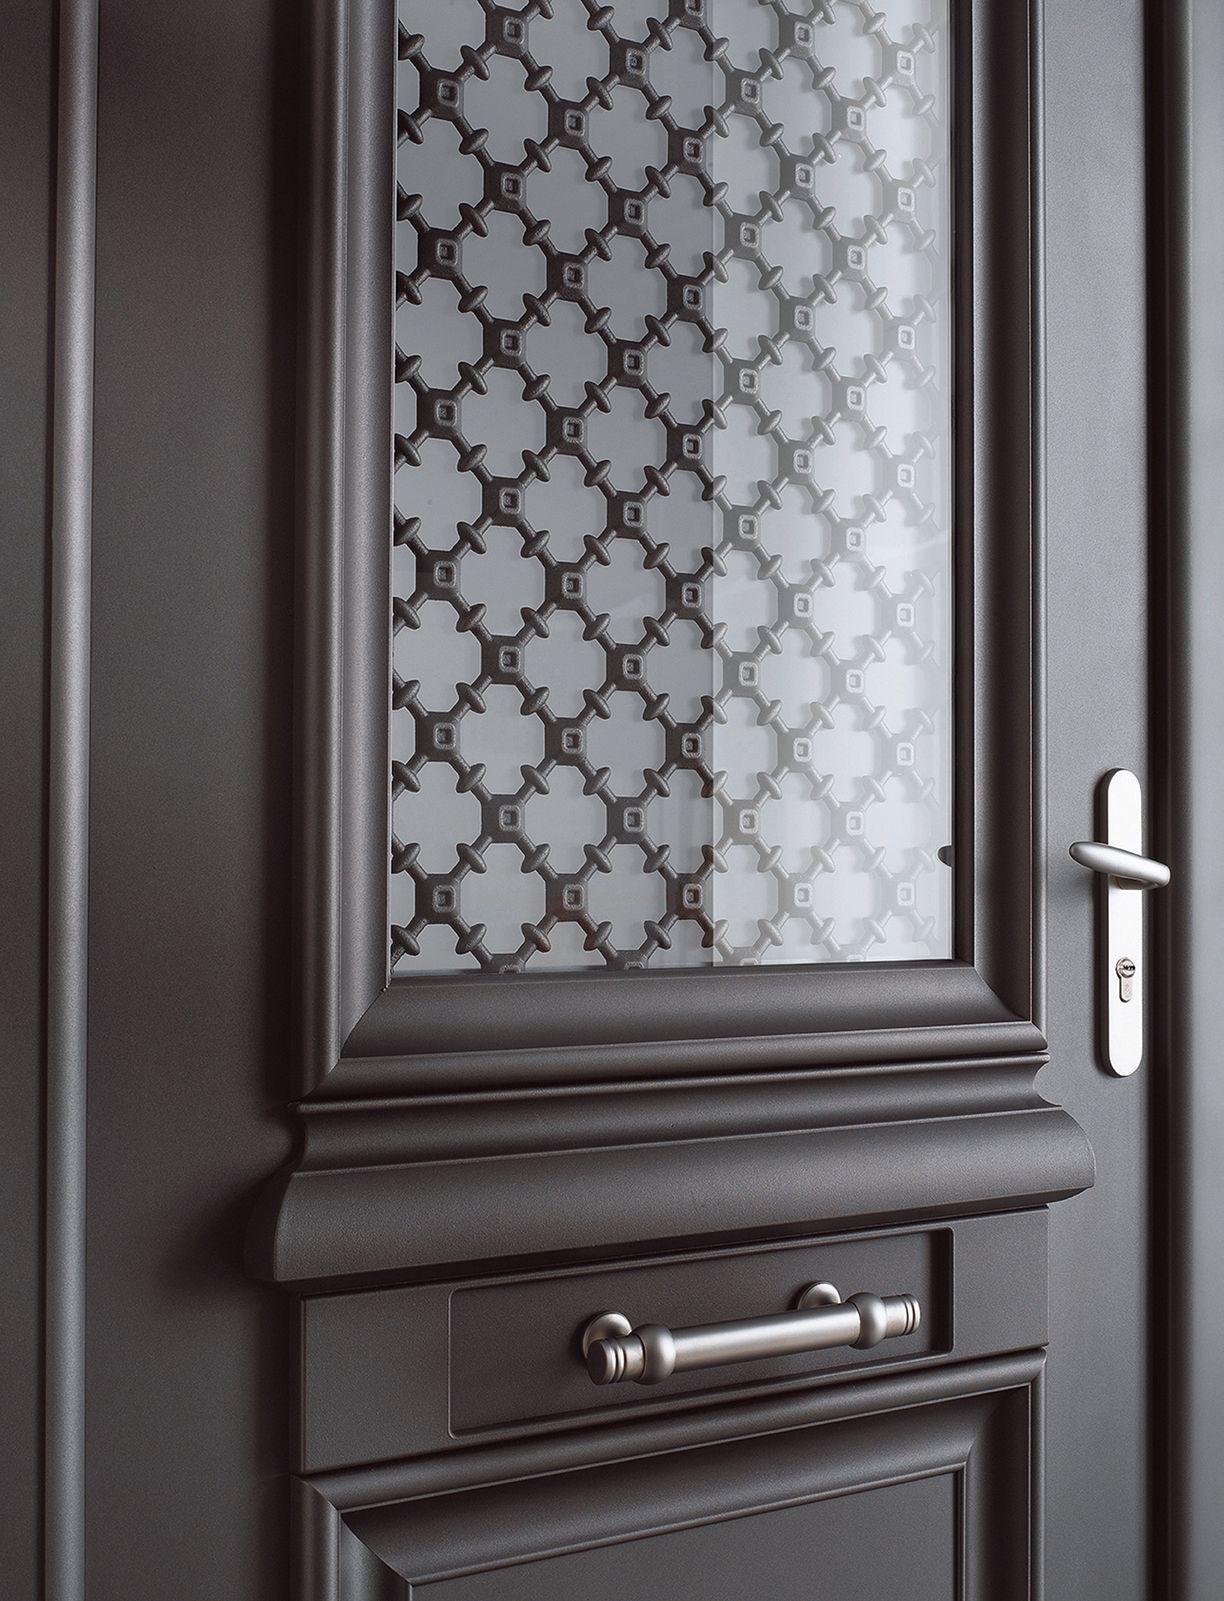 ath na porte d 39 entr e aluminium classique mi vitr e bel 39 m porte pinterest ath na. Black Bedroom Furniture Sets. Home Design Ideas